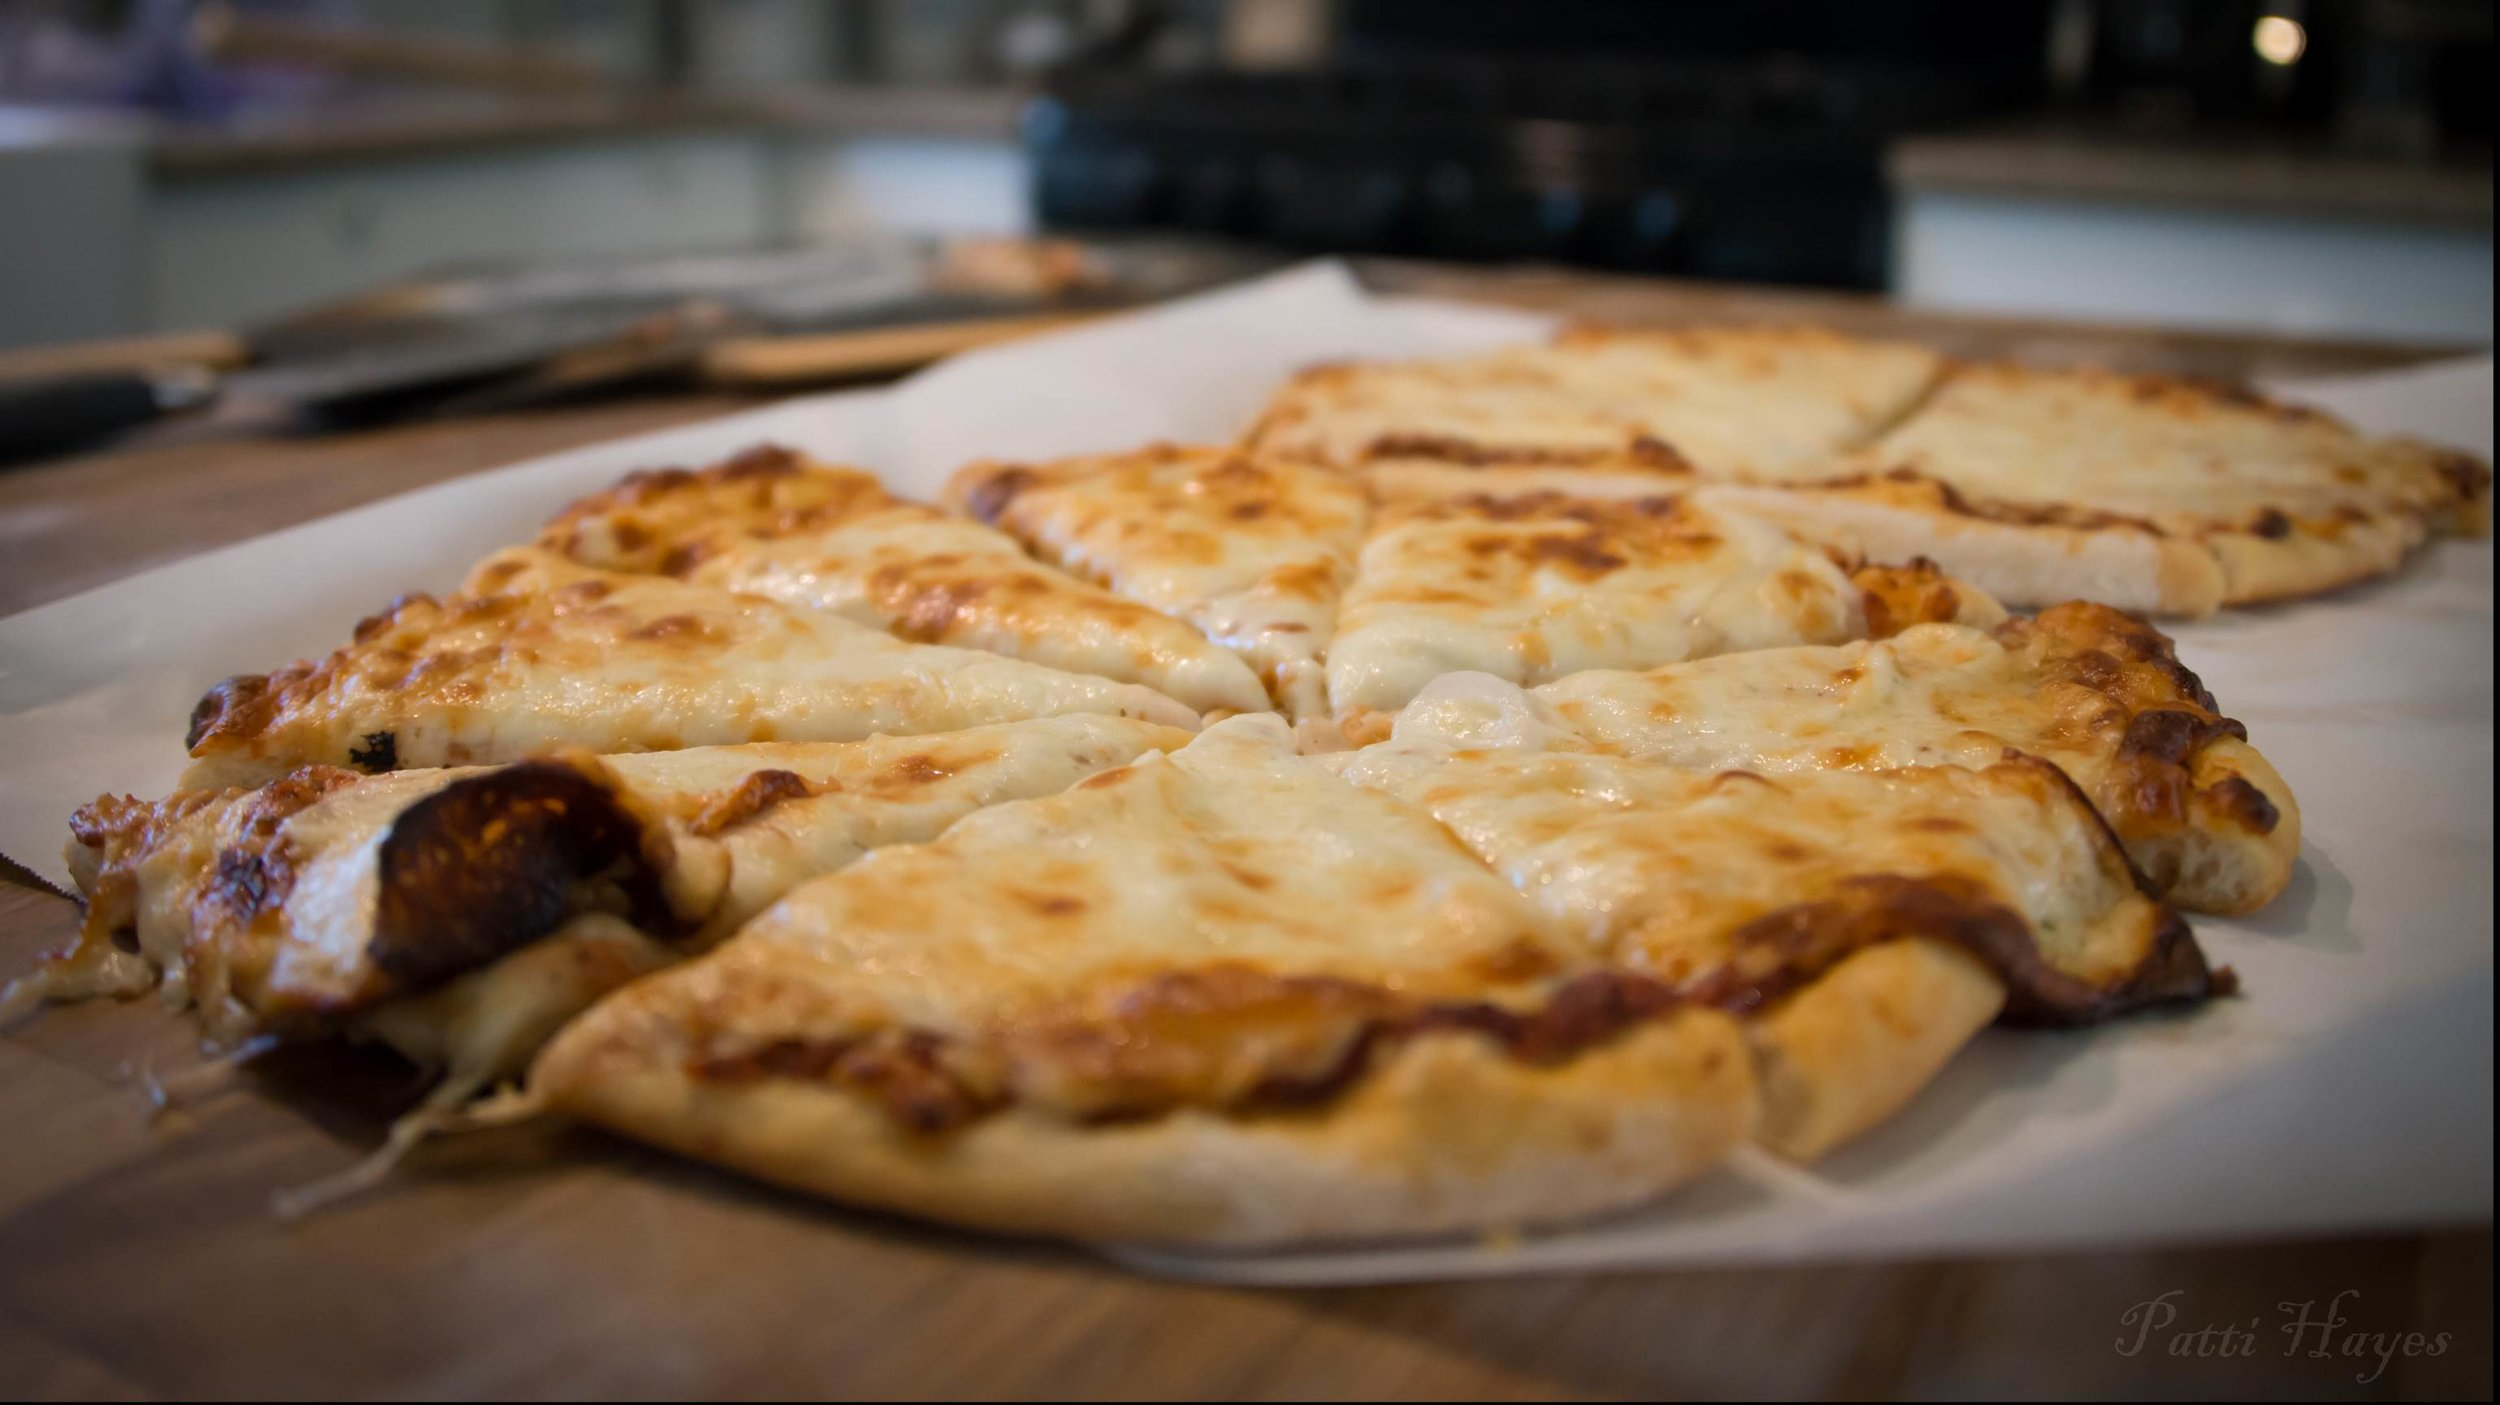 Pete's homemade pizza